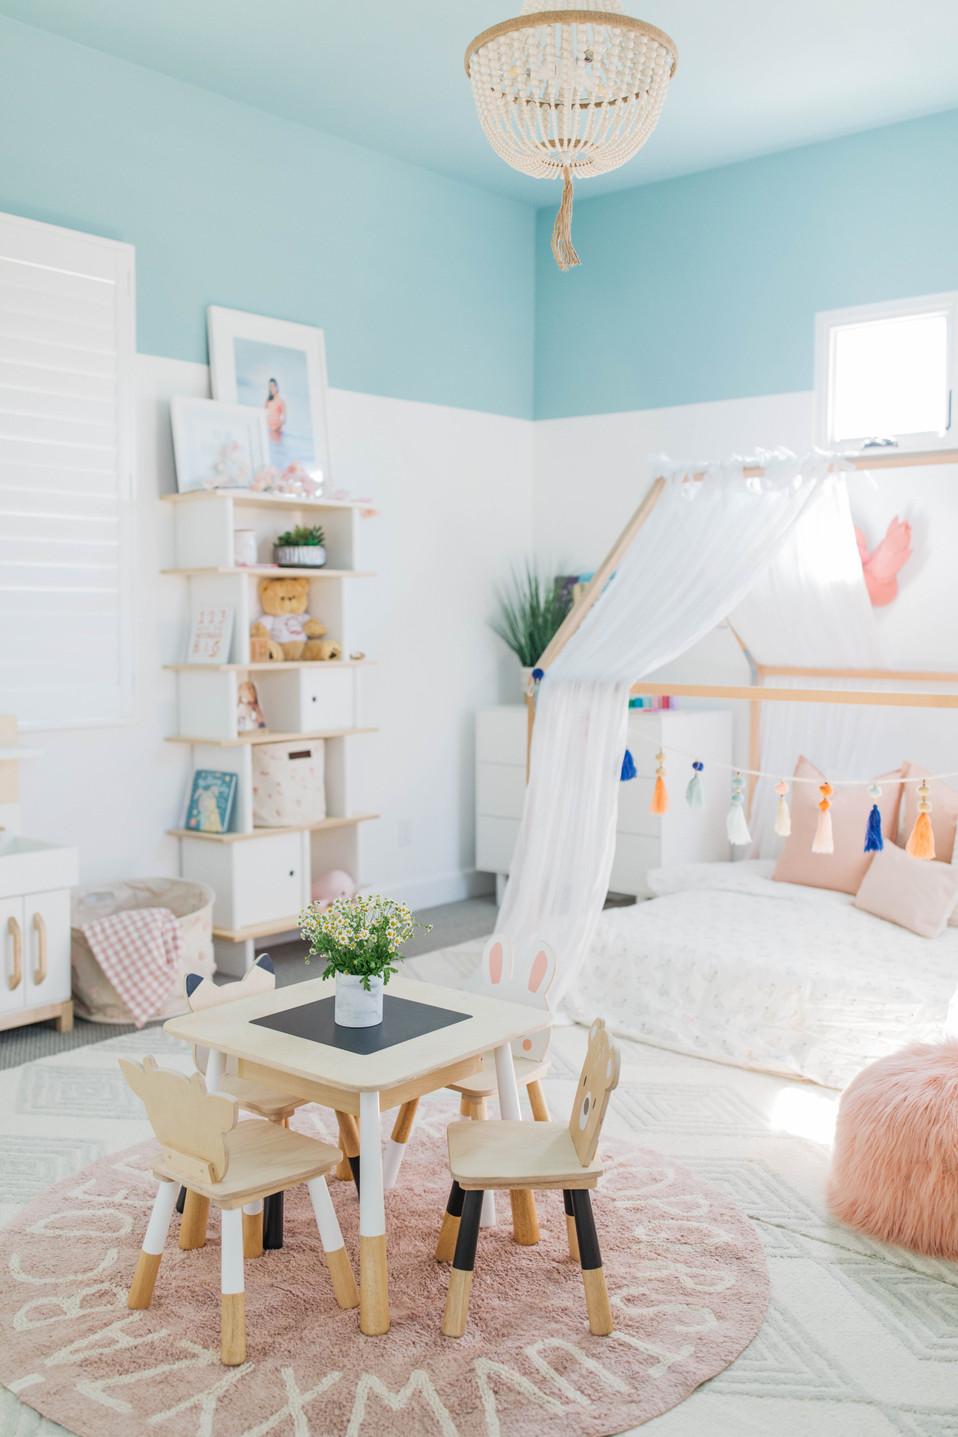 Emmy's Bedroom Wonderland   Realm Design Co. San Diego, CA   Photographer Halli MaKennah